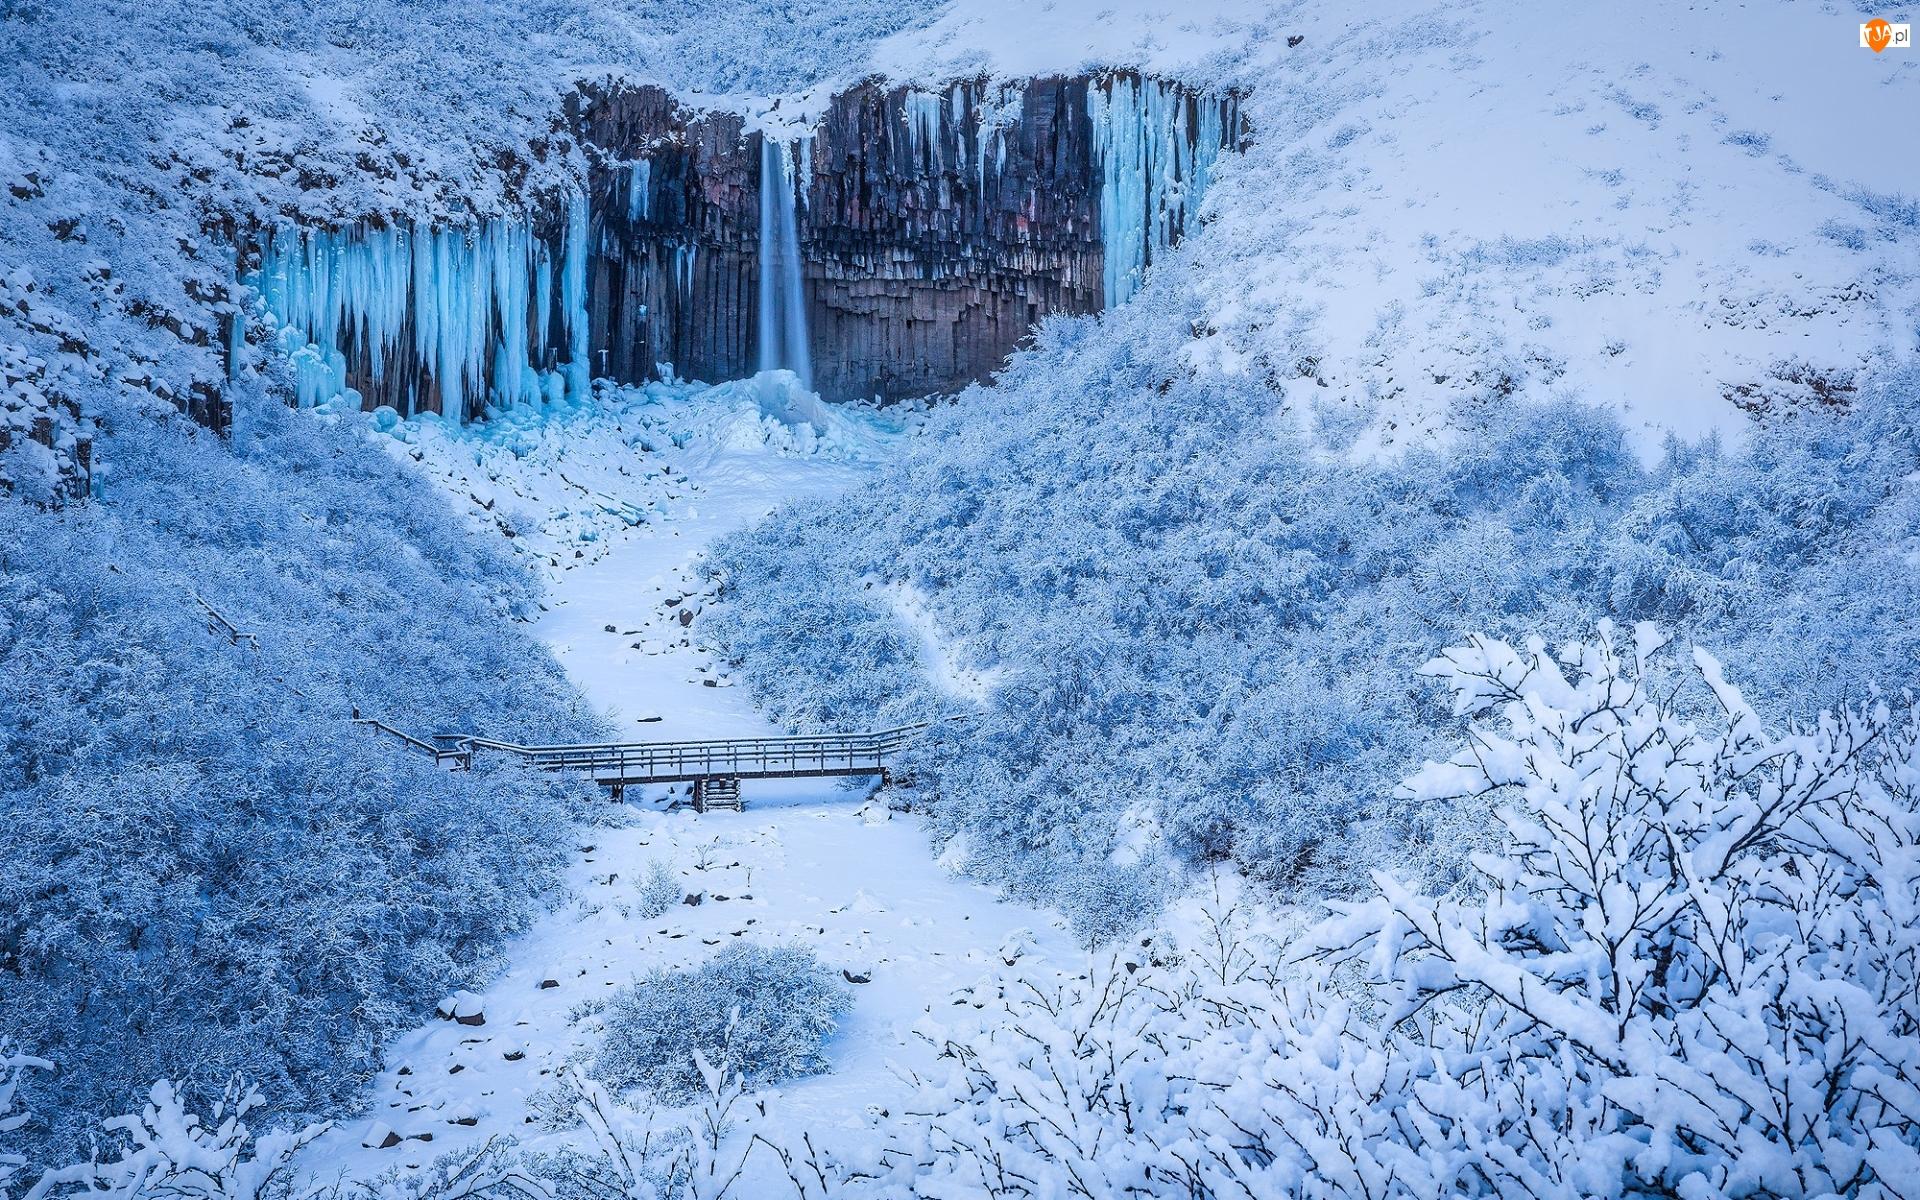 Islandia, Wodospad, Park Narodowy Vatnajokull, Most, Rzeka, Svartifoss Falls, Skały, Zima, Sople